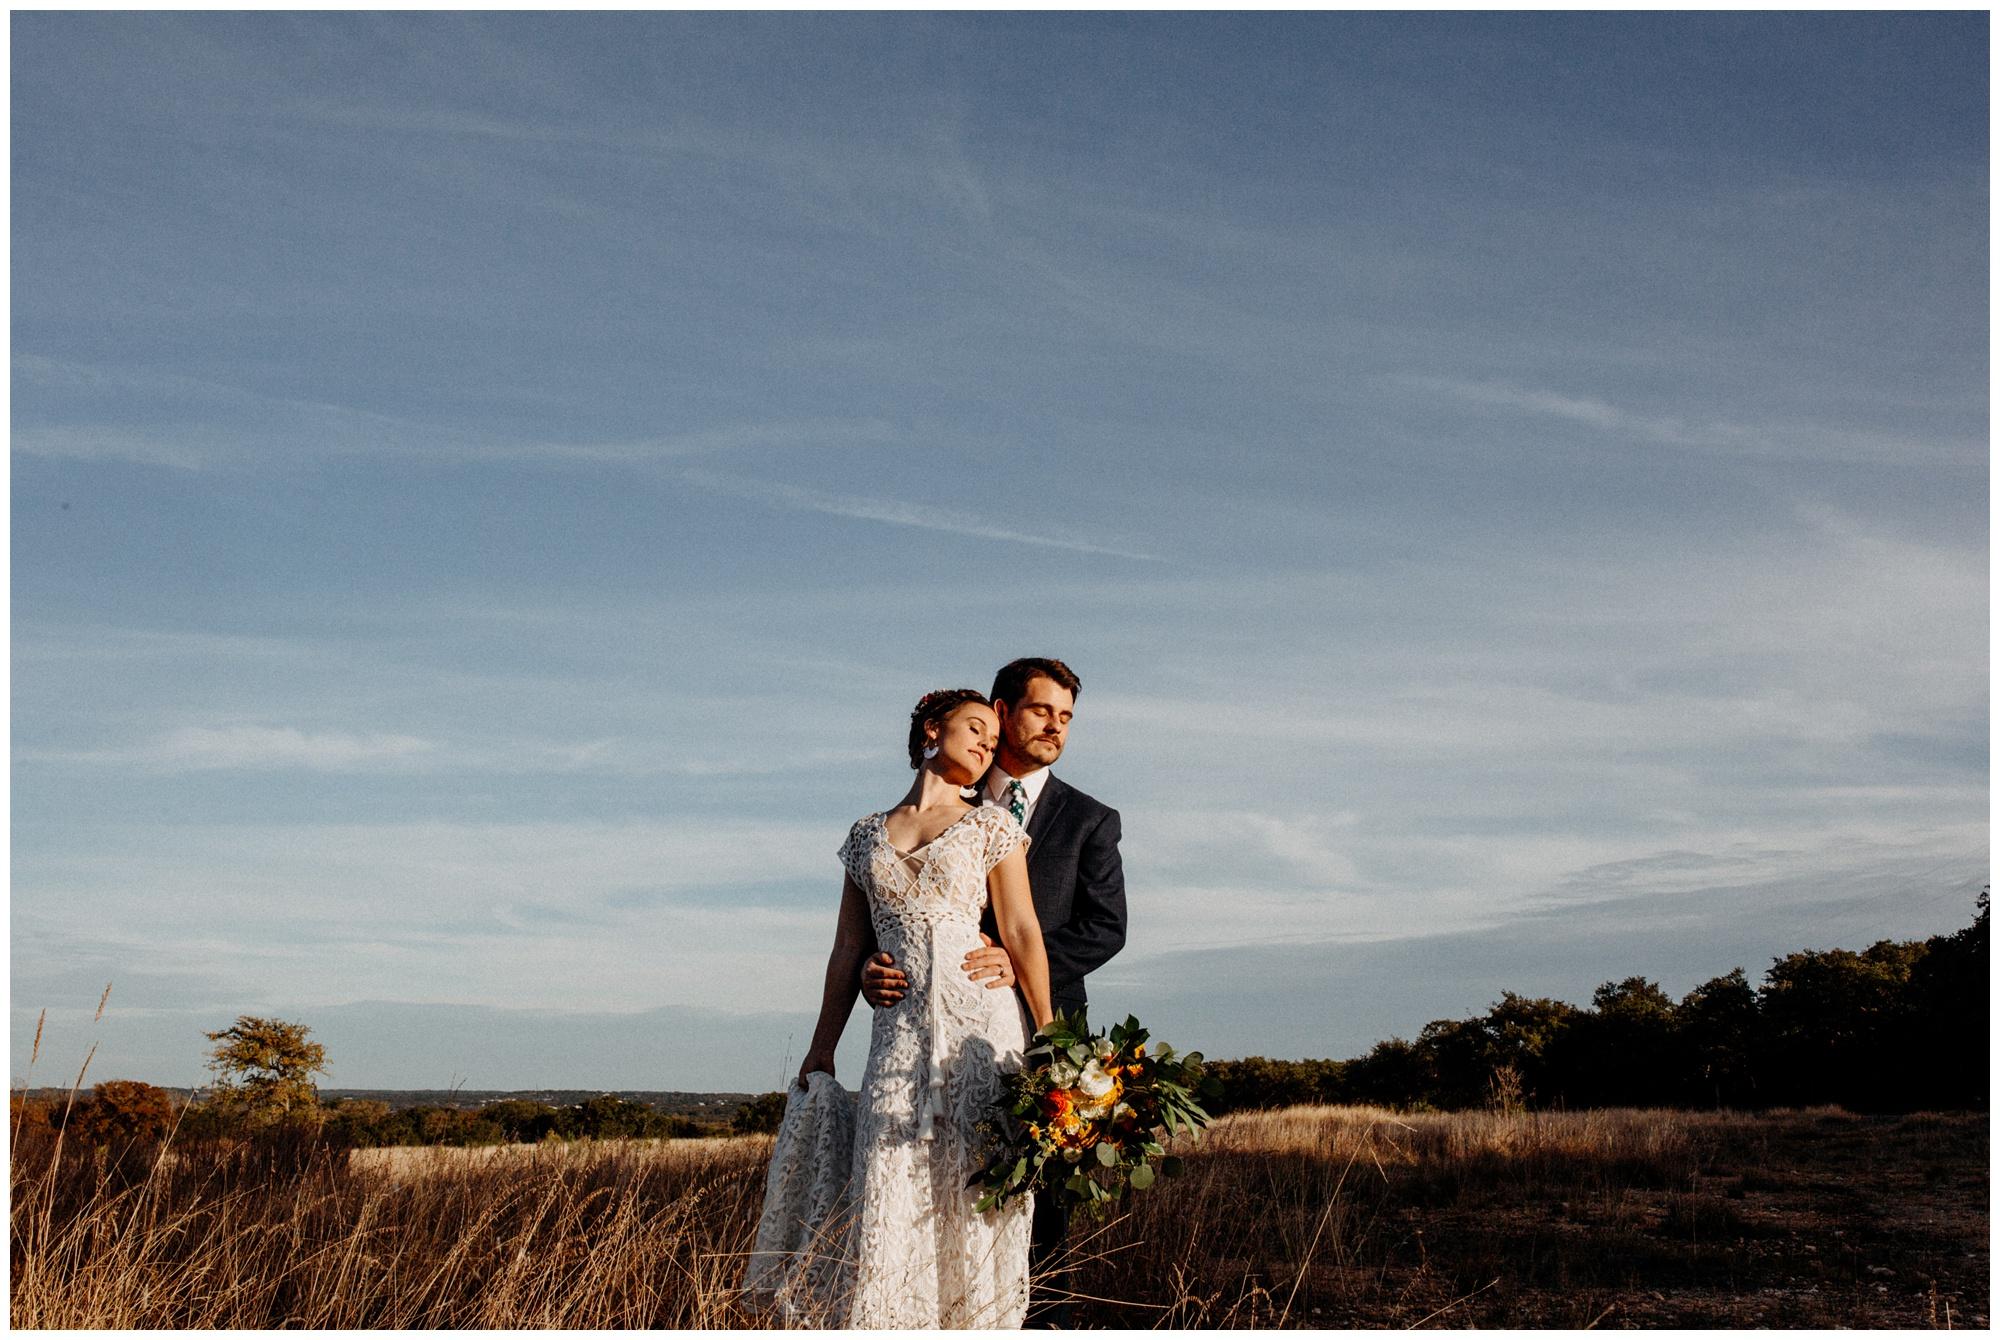 AUSTIN-TEXAS-PROSPECT-HOUSE-WEDDING-VENUE-PHOTOGRAPHY25812.JPG